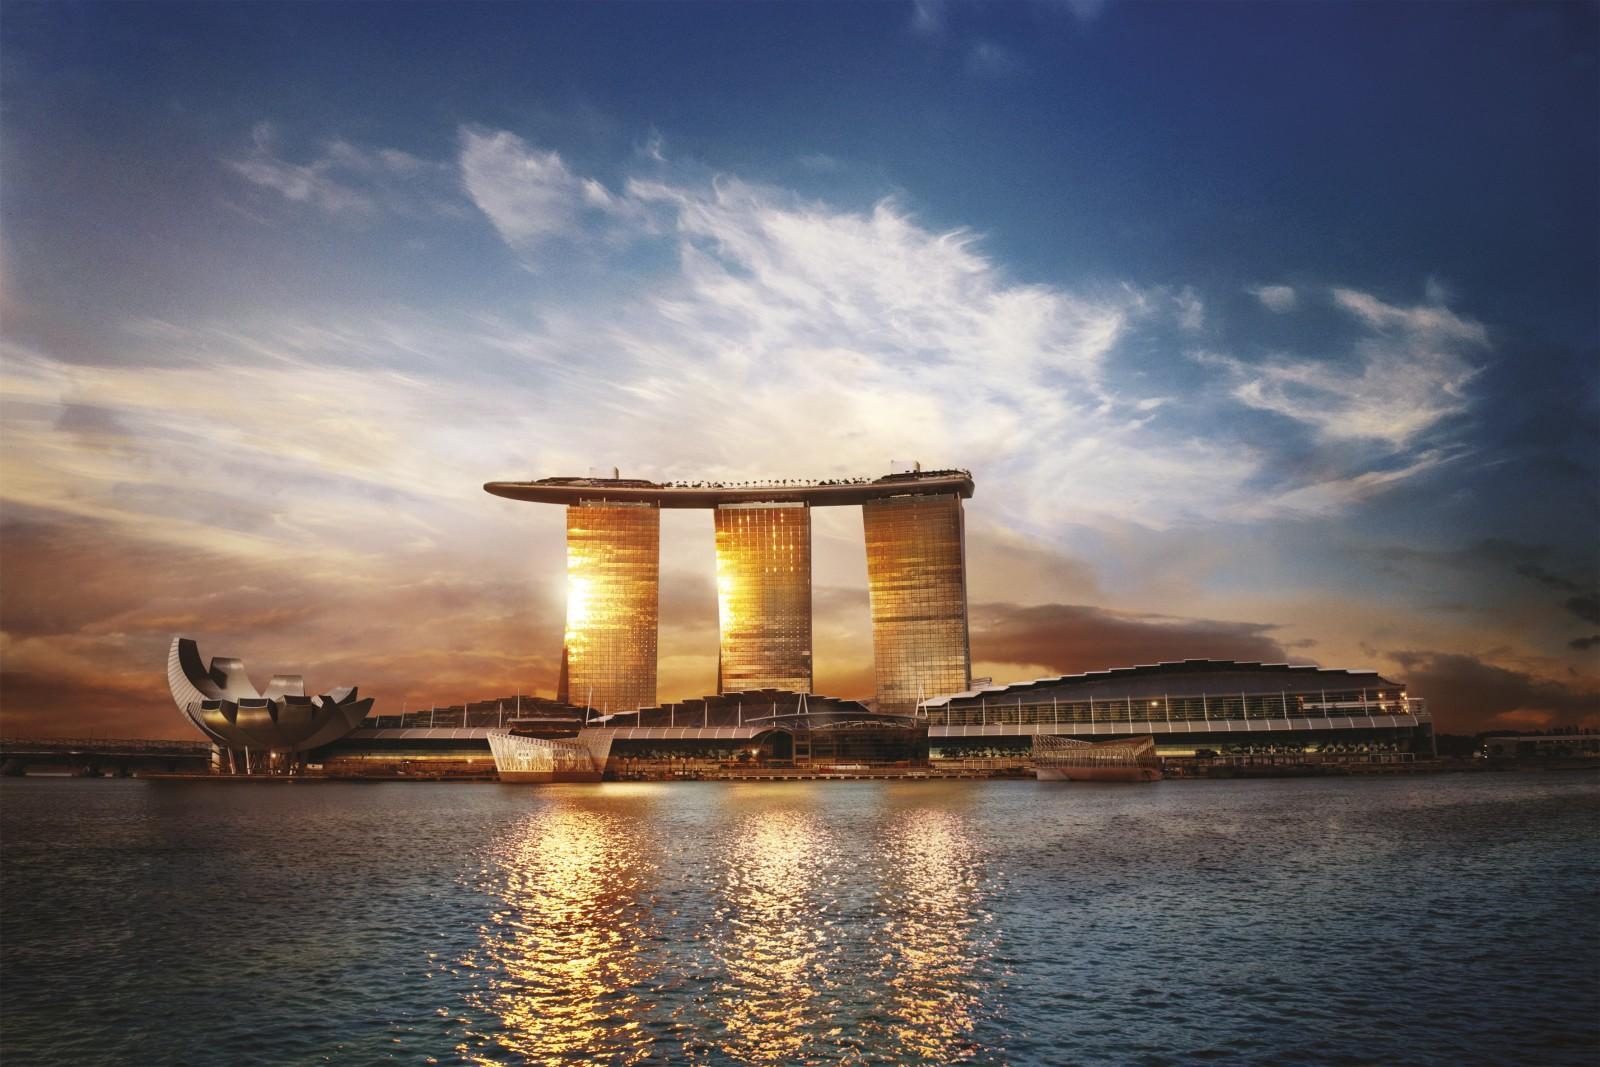 Marina Bay Sands 2 image